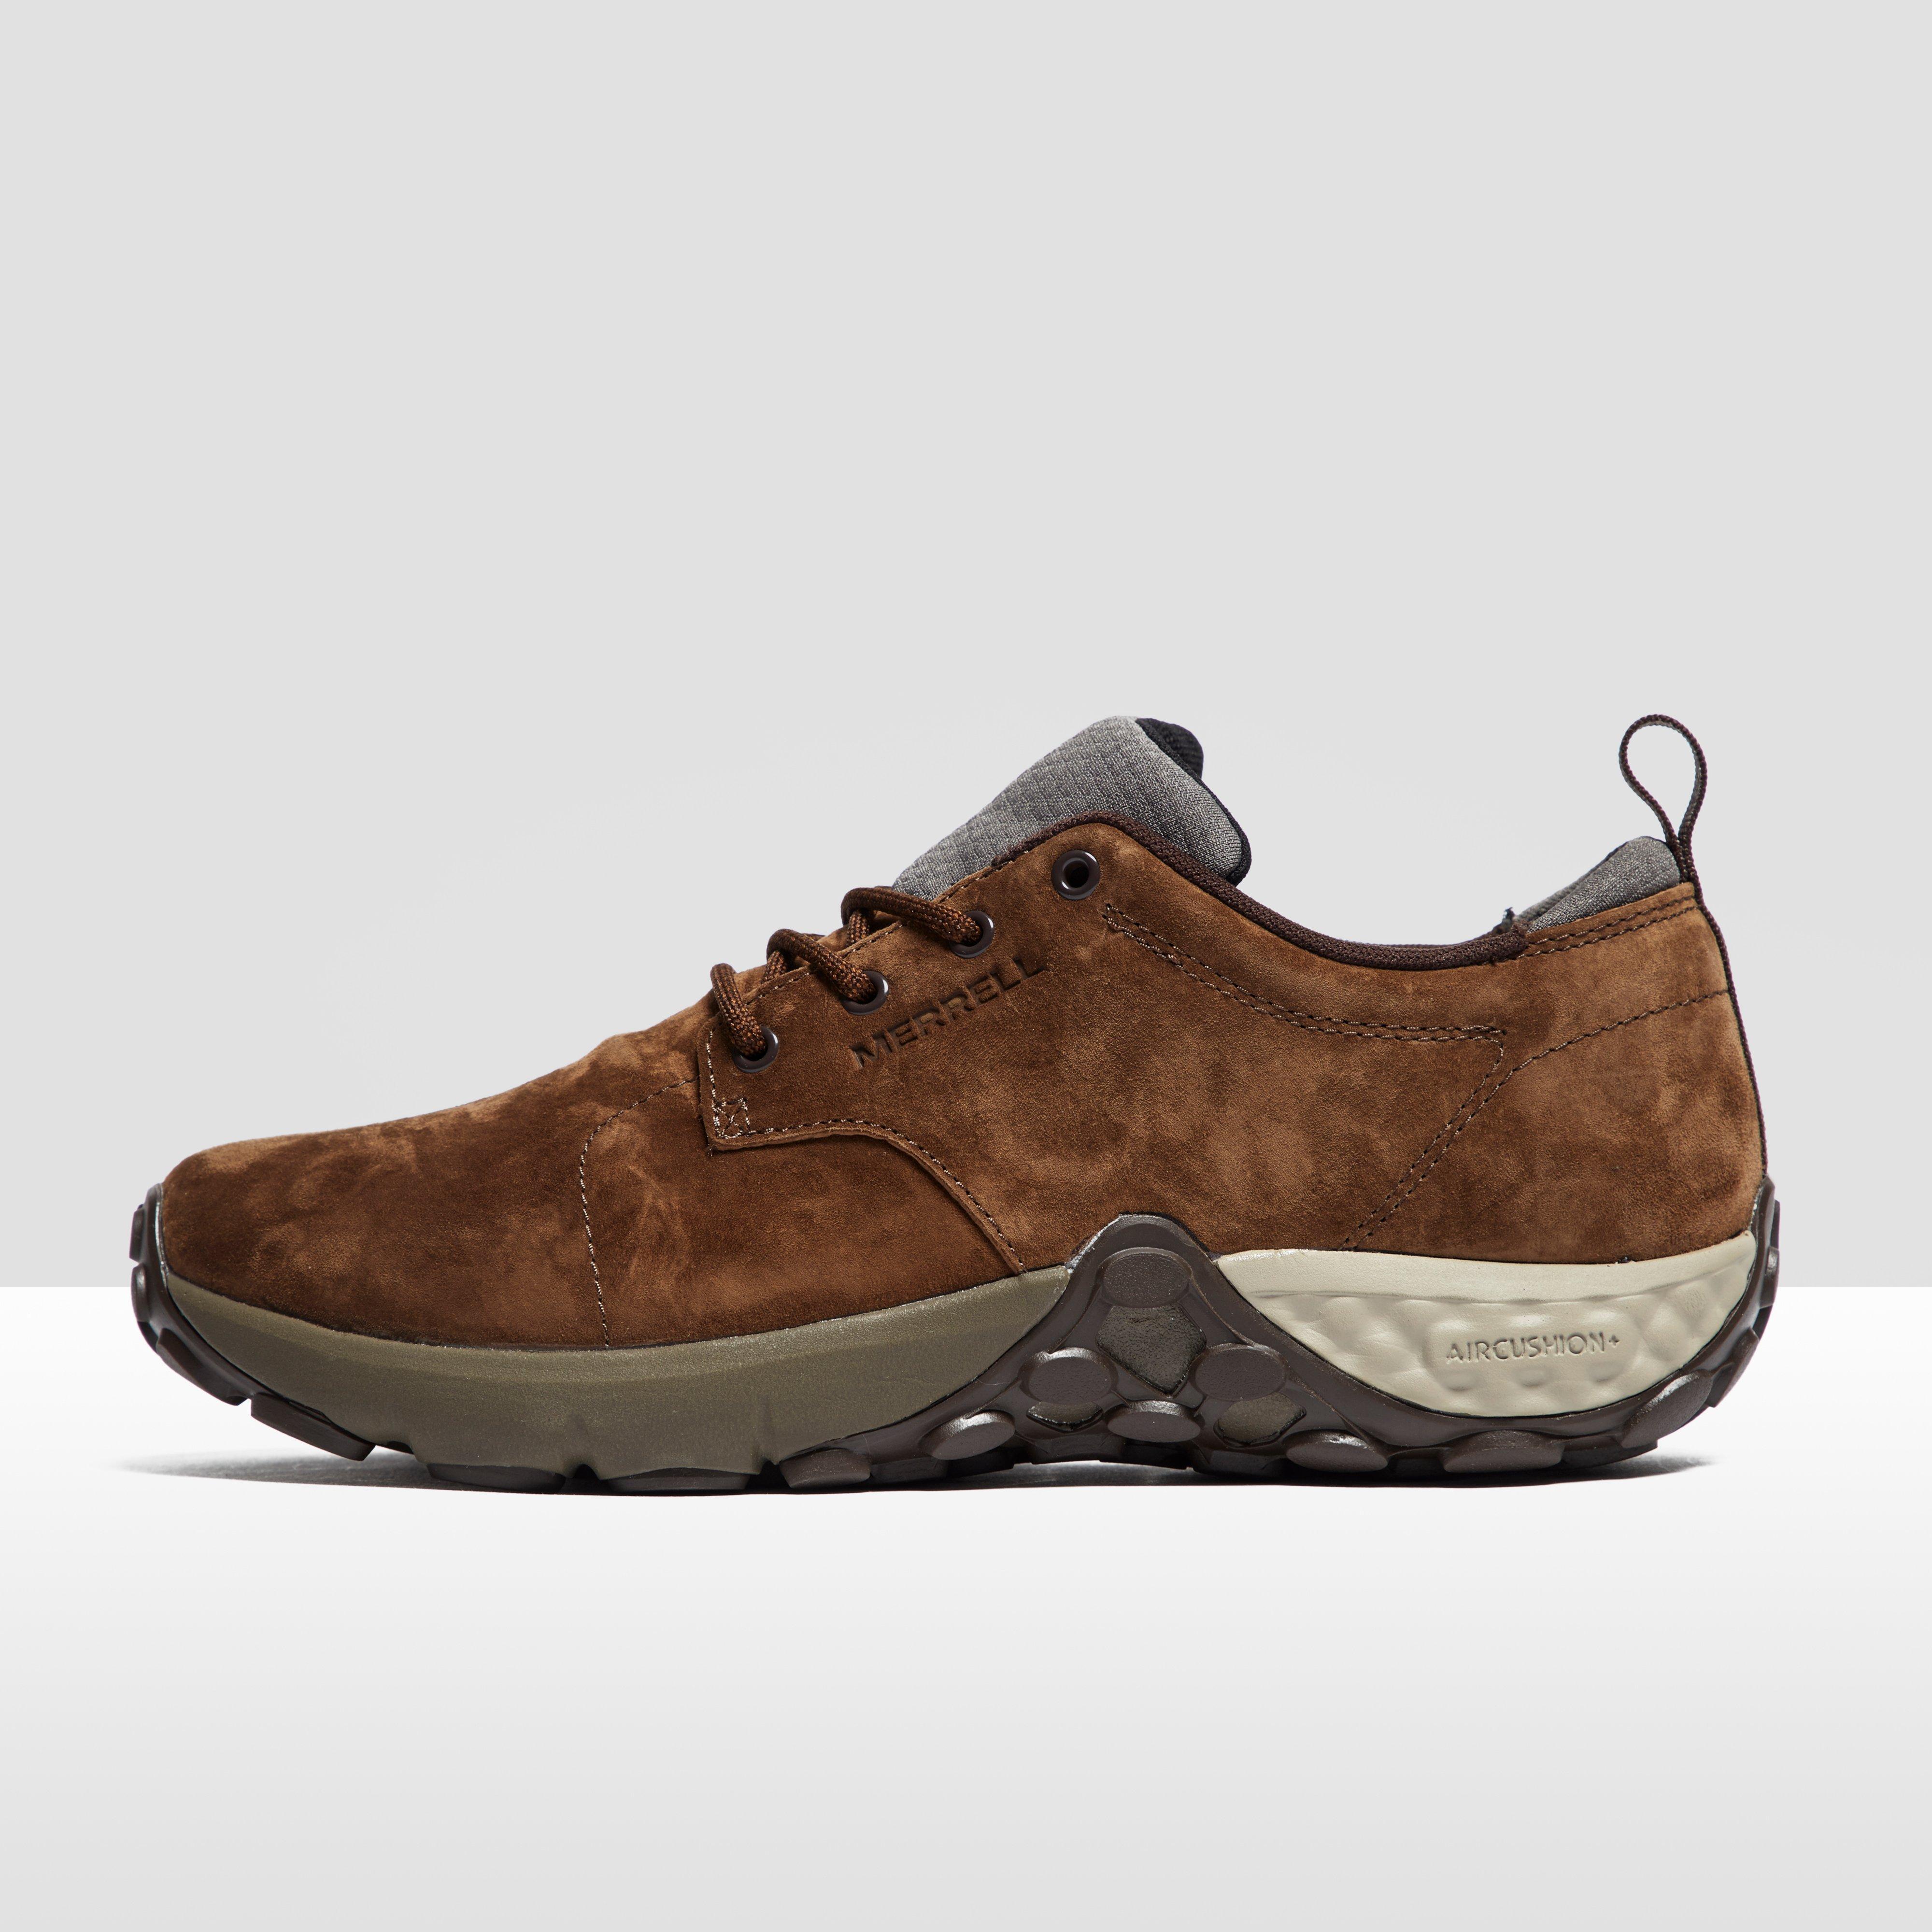 2c39a55f82ce5 Details about Merrell Jungle Lace Ac Men s Walking Shoes Brown